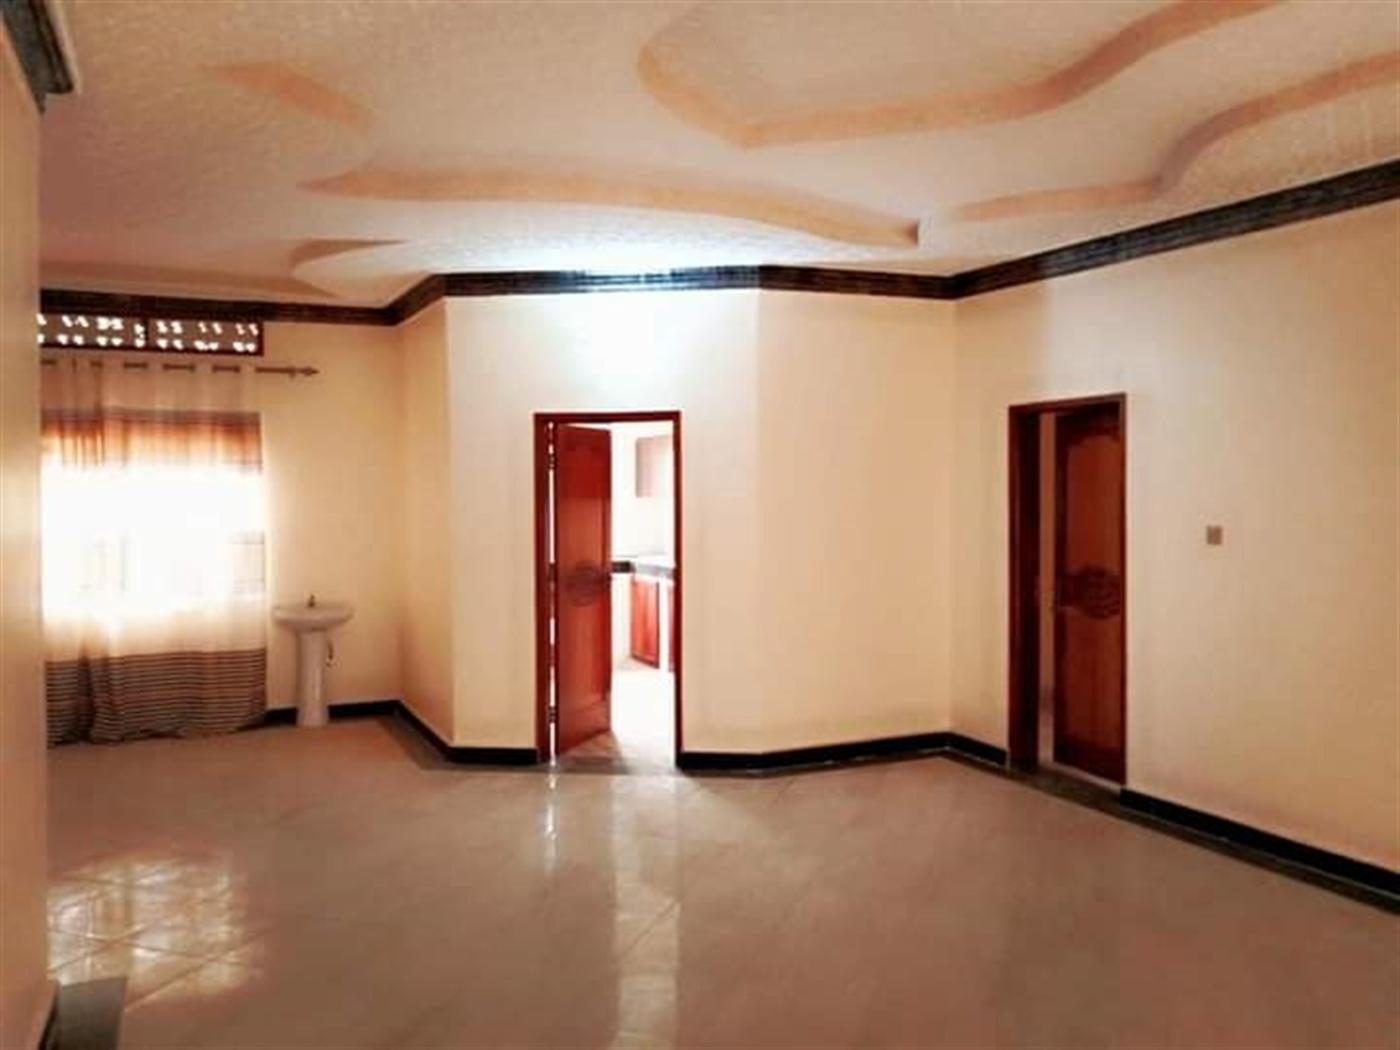 Storyed house for sale in Naguru Wakiso